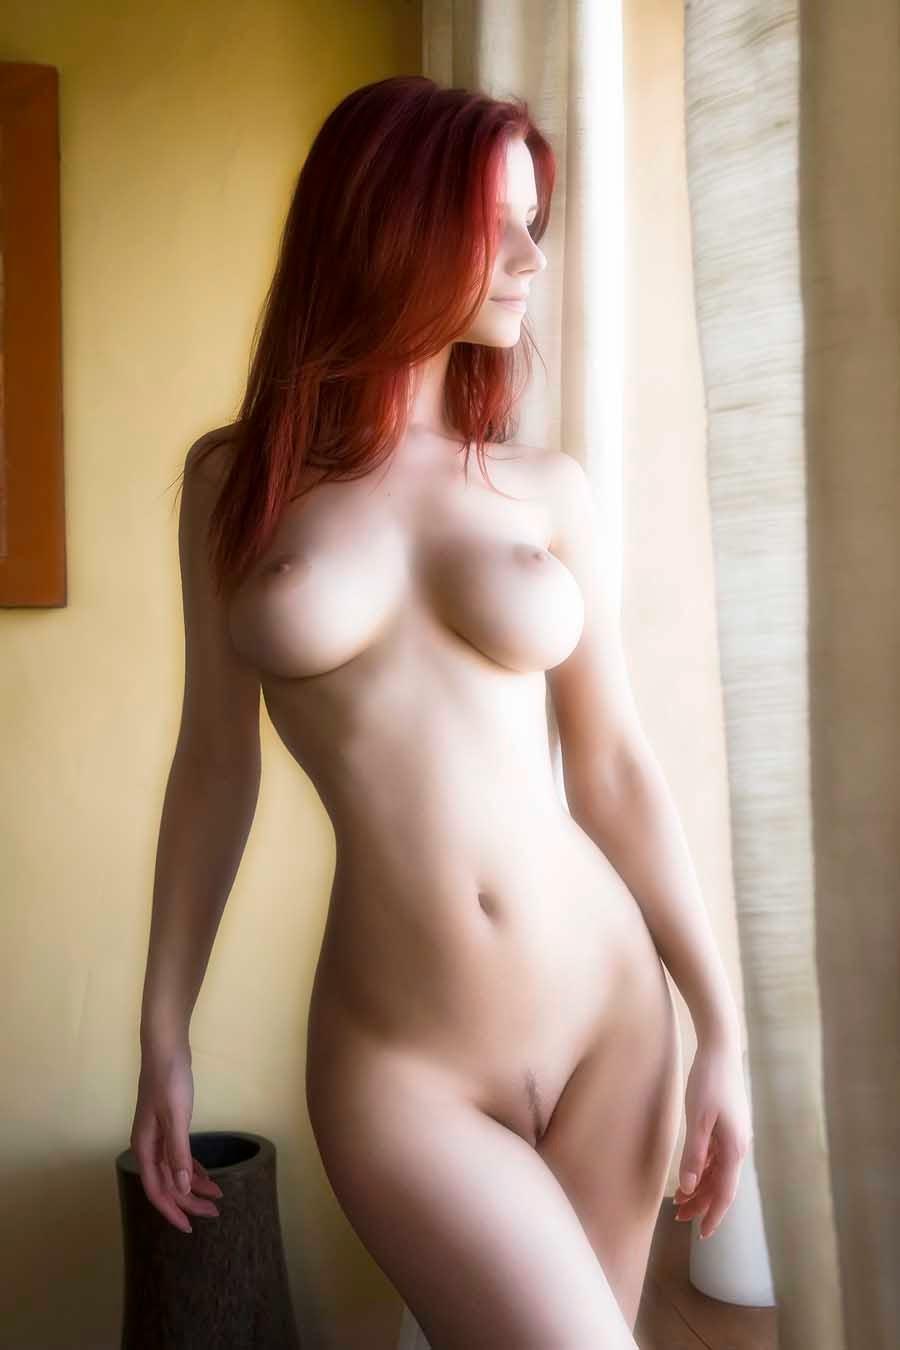 Bikini Non Nude Nonudegirls Photos